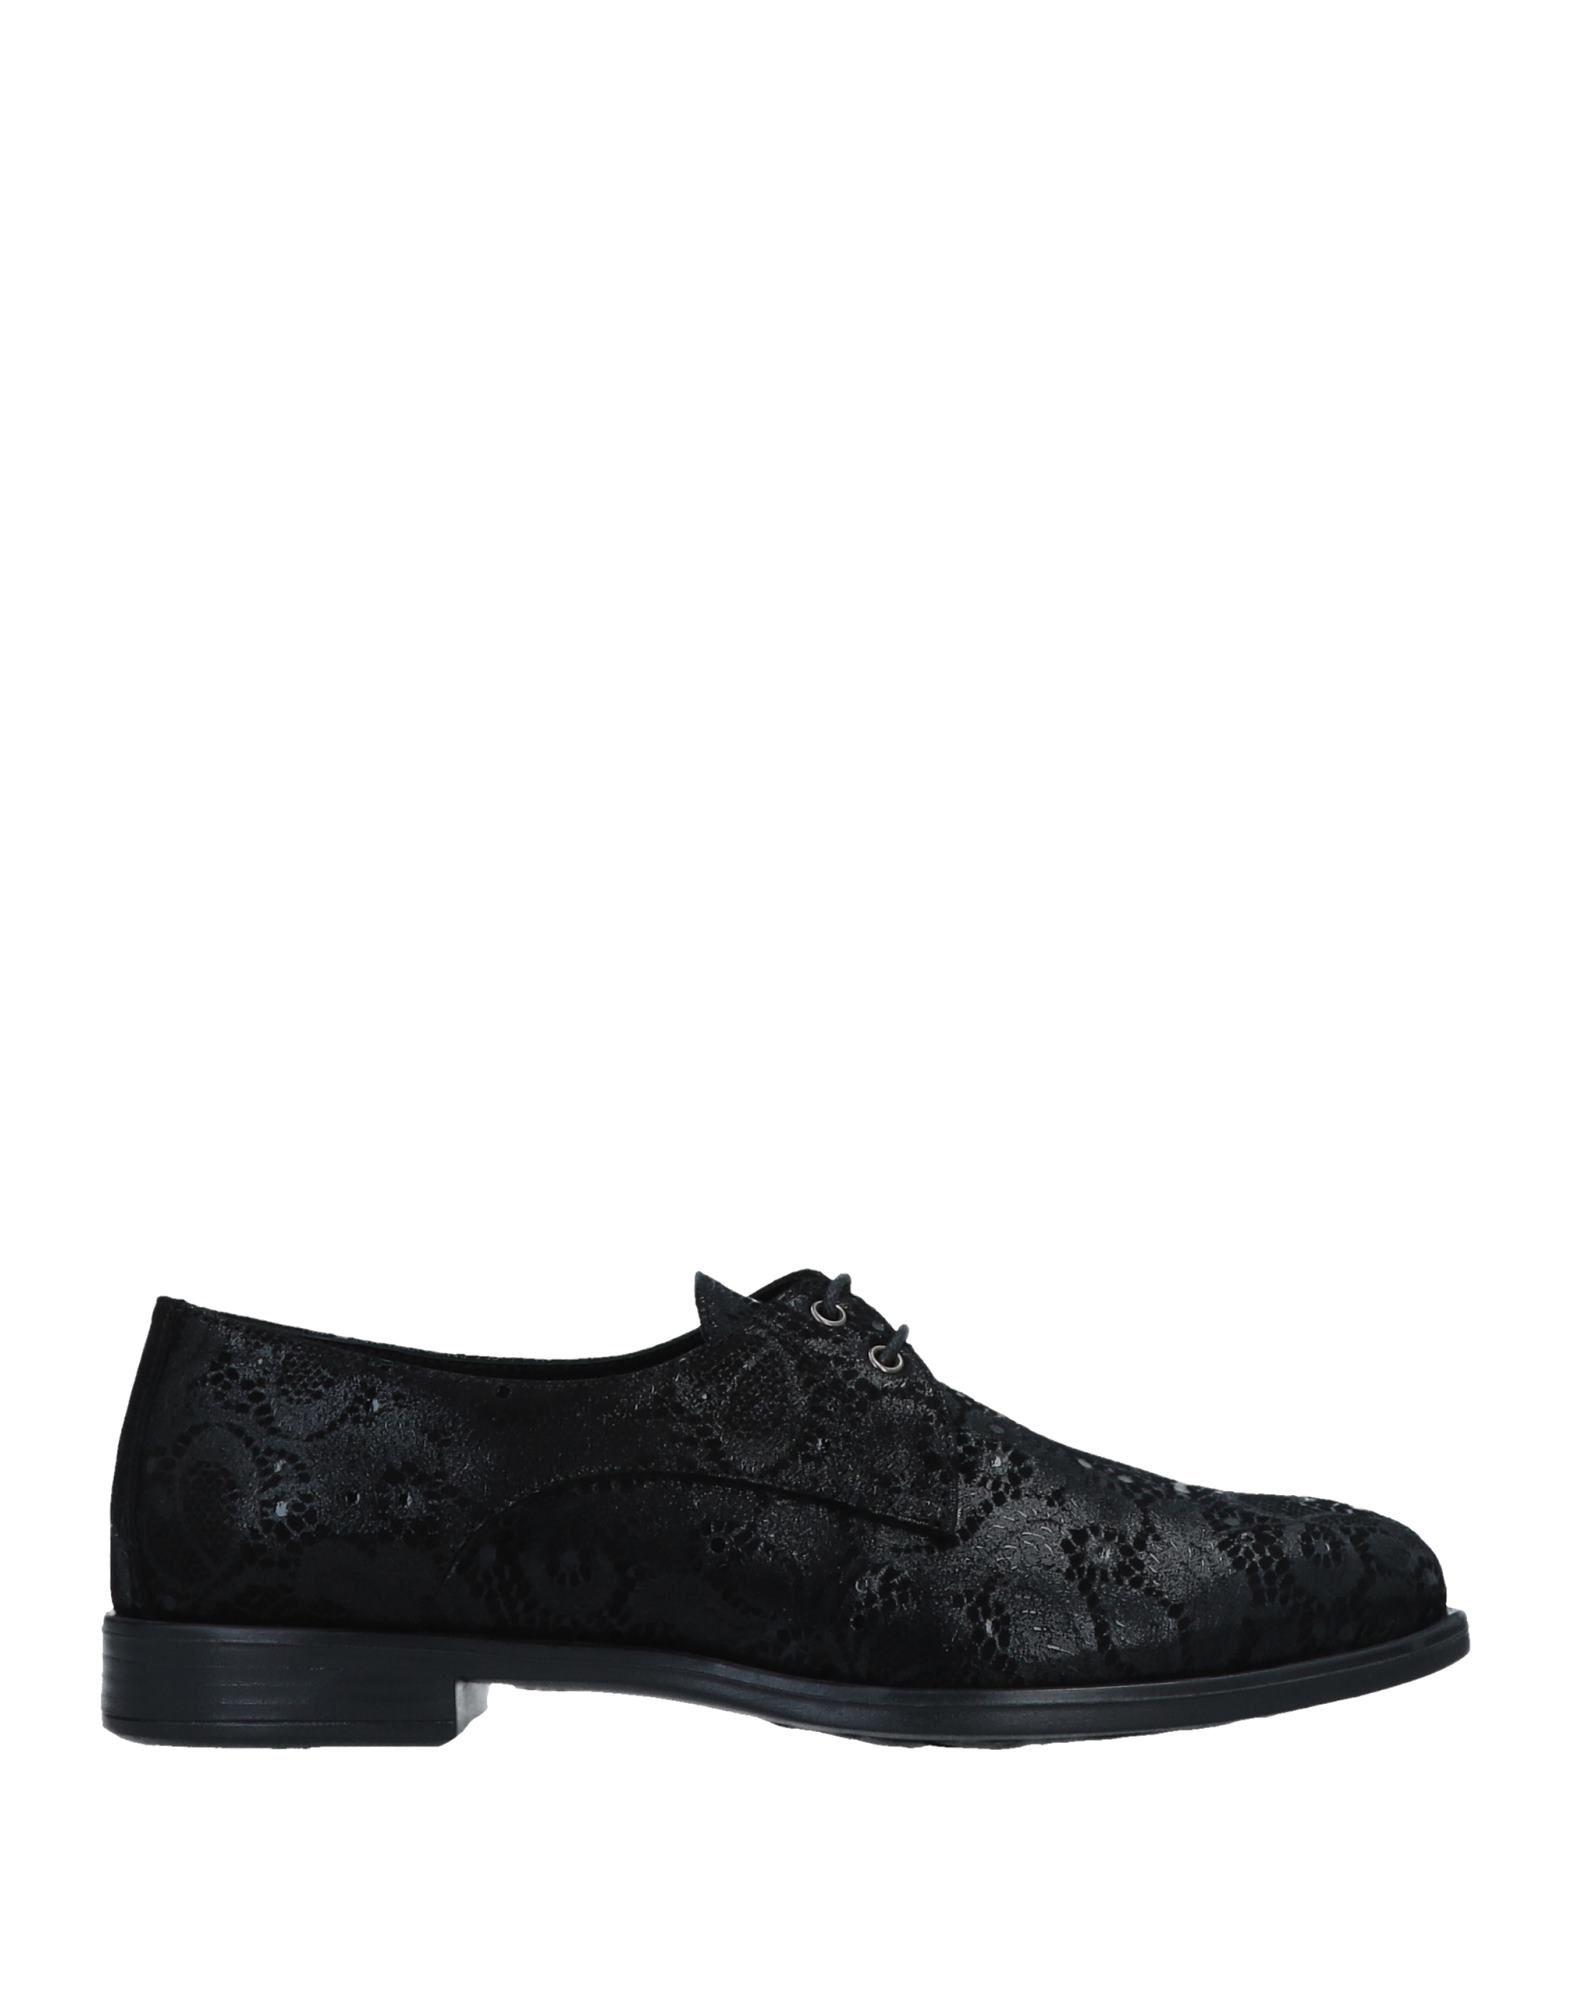 Shoppable Search D Island Shoes Moccasine Slip On Lacoste Suede Black 11510636de 14 F